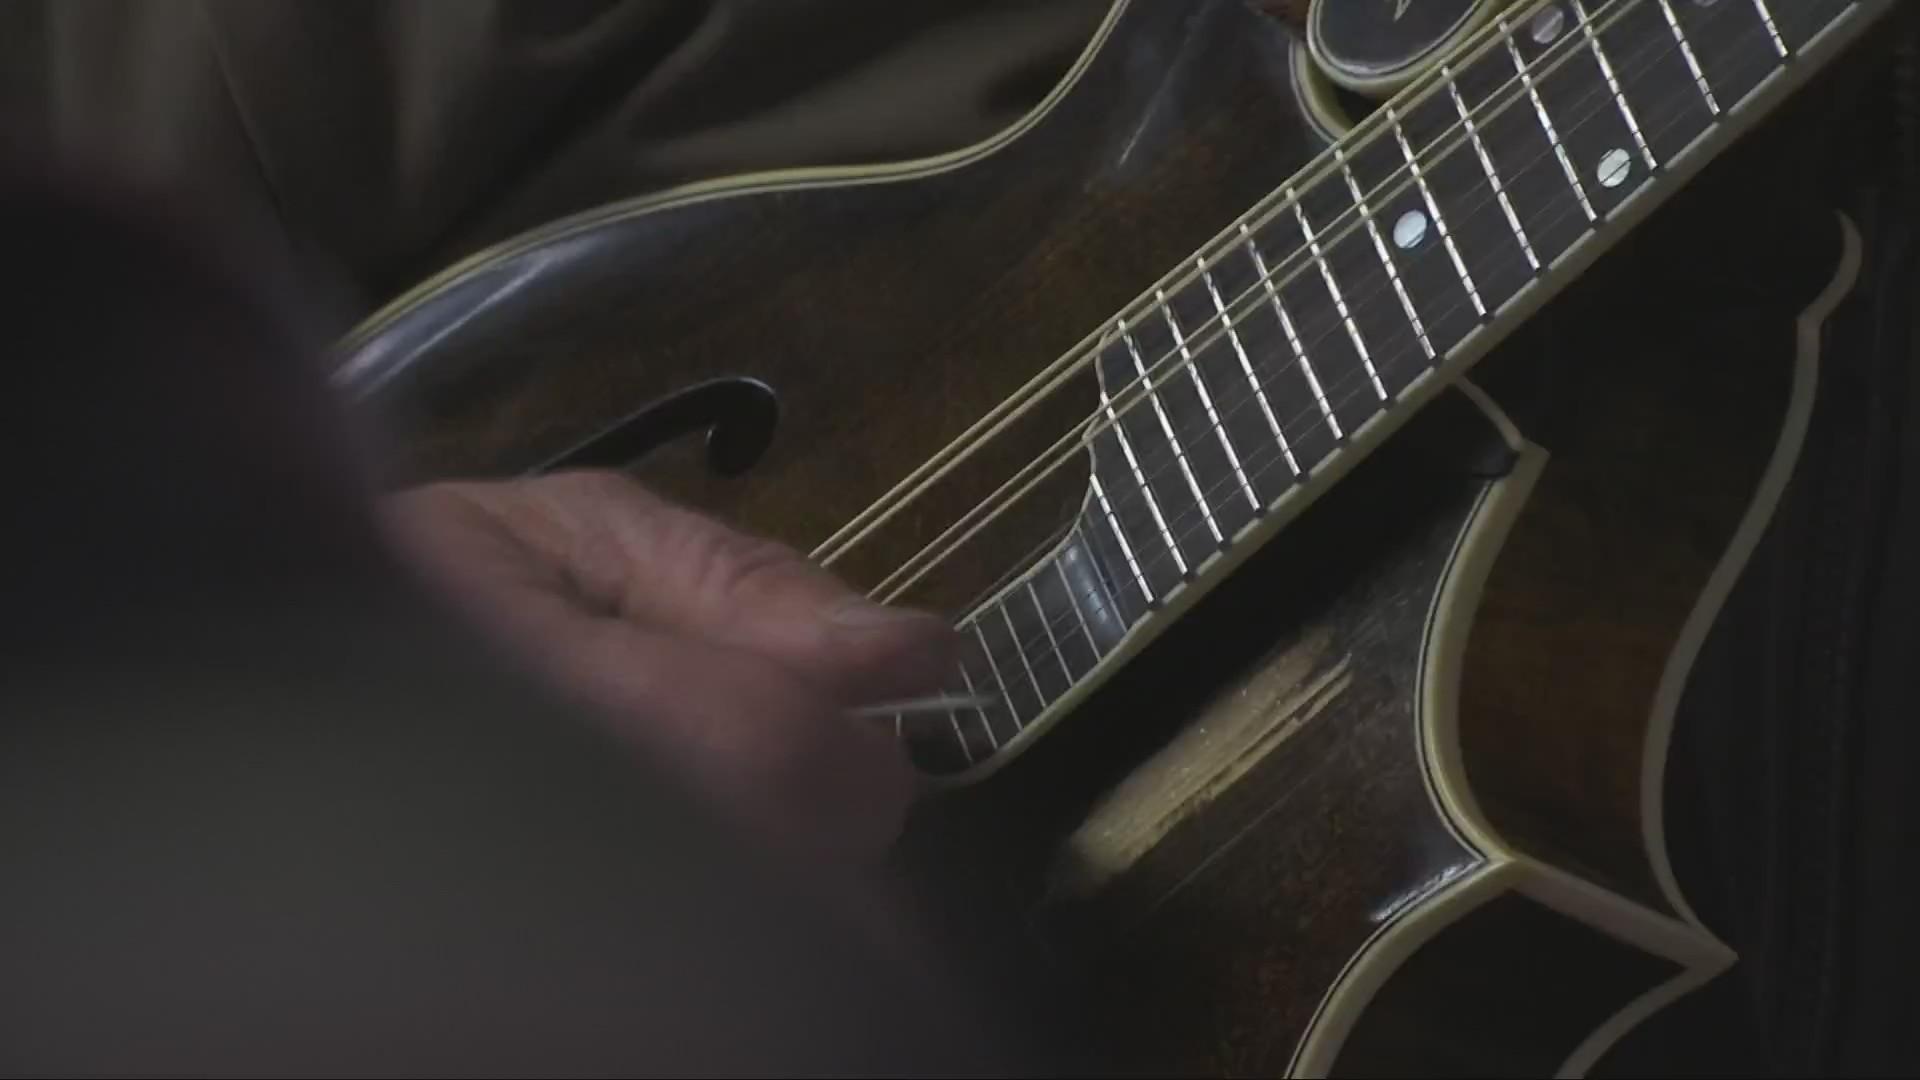 The Mandolin UPS Man